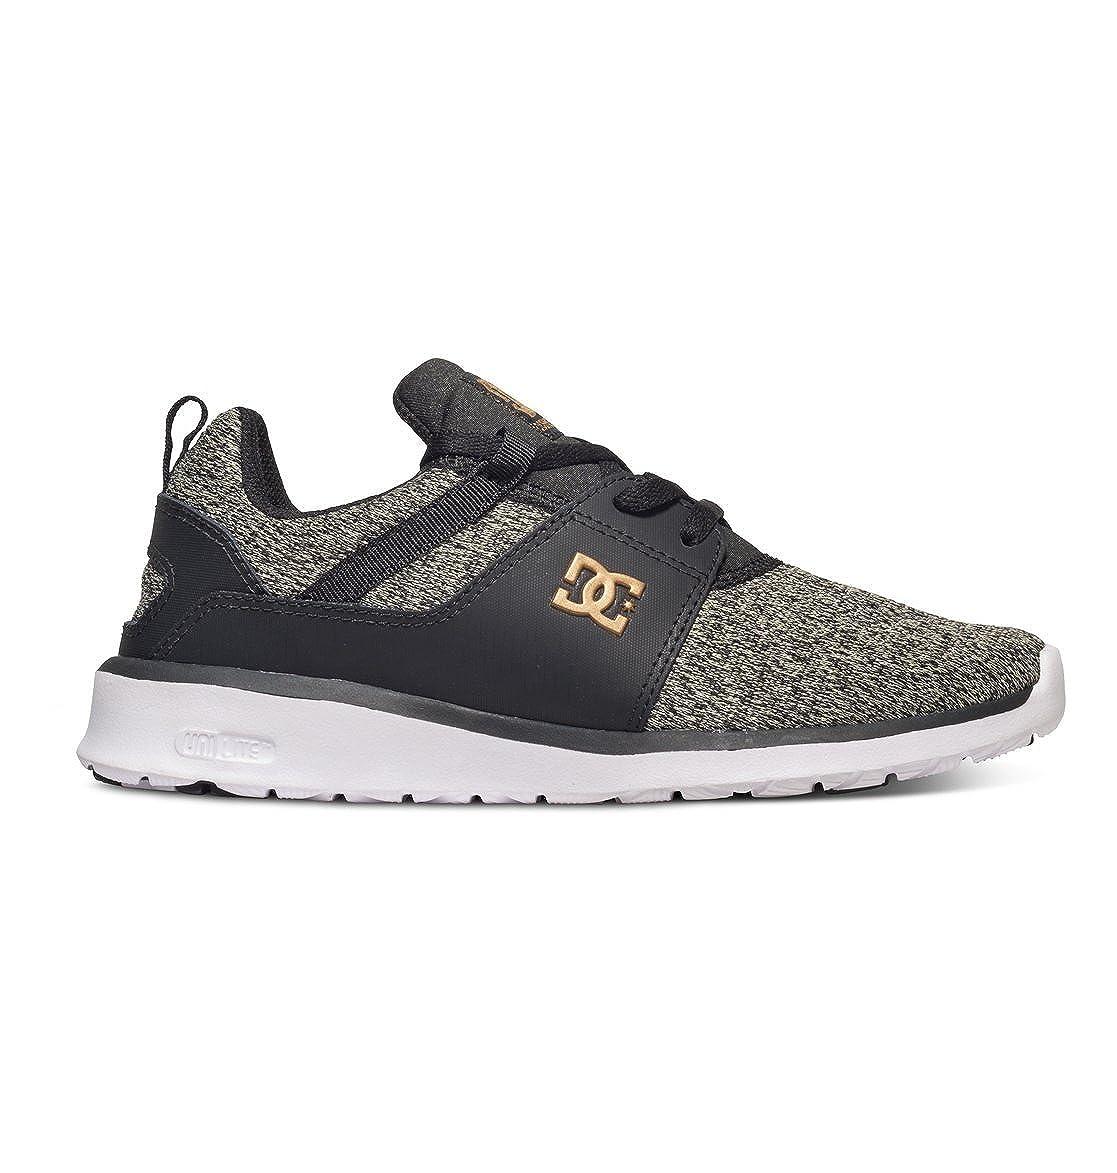 DC Shoes Heathrow Se J - Zapatillas de Deporte Mujer ADJS700022-GLD